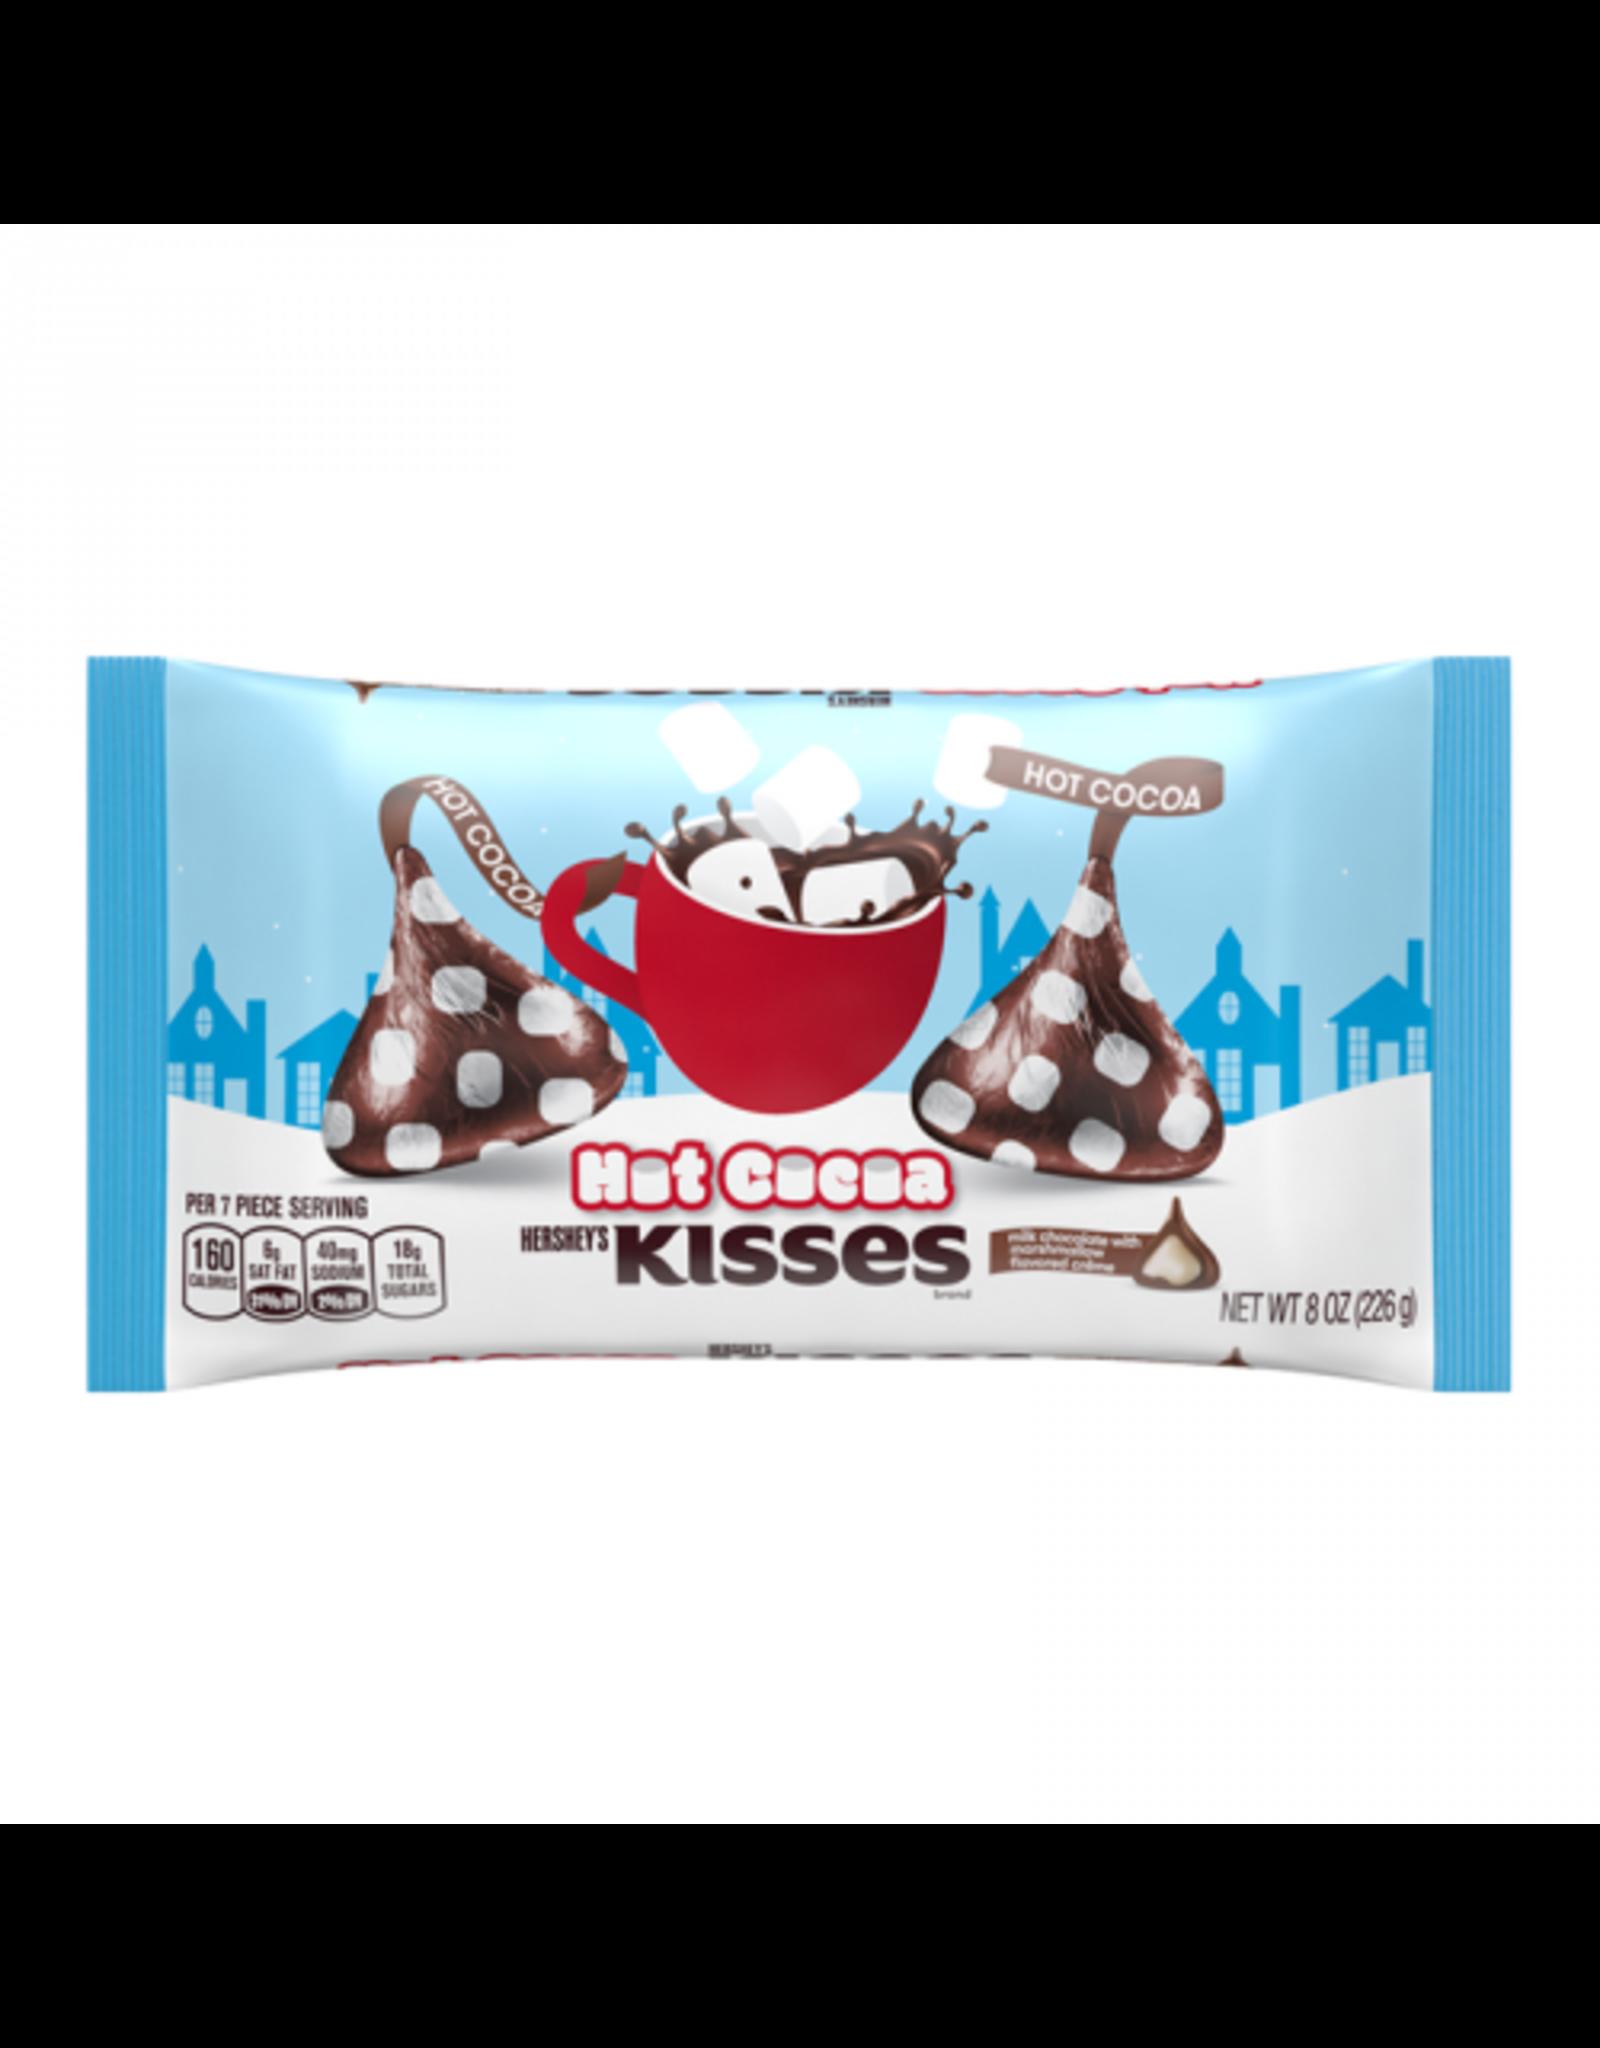 Hershey Hot Cocoa Kisses - 226g